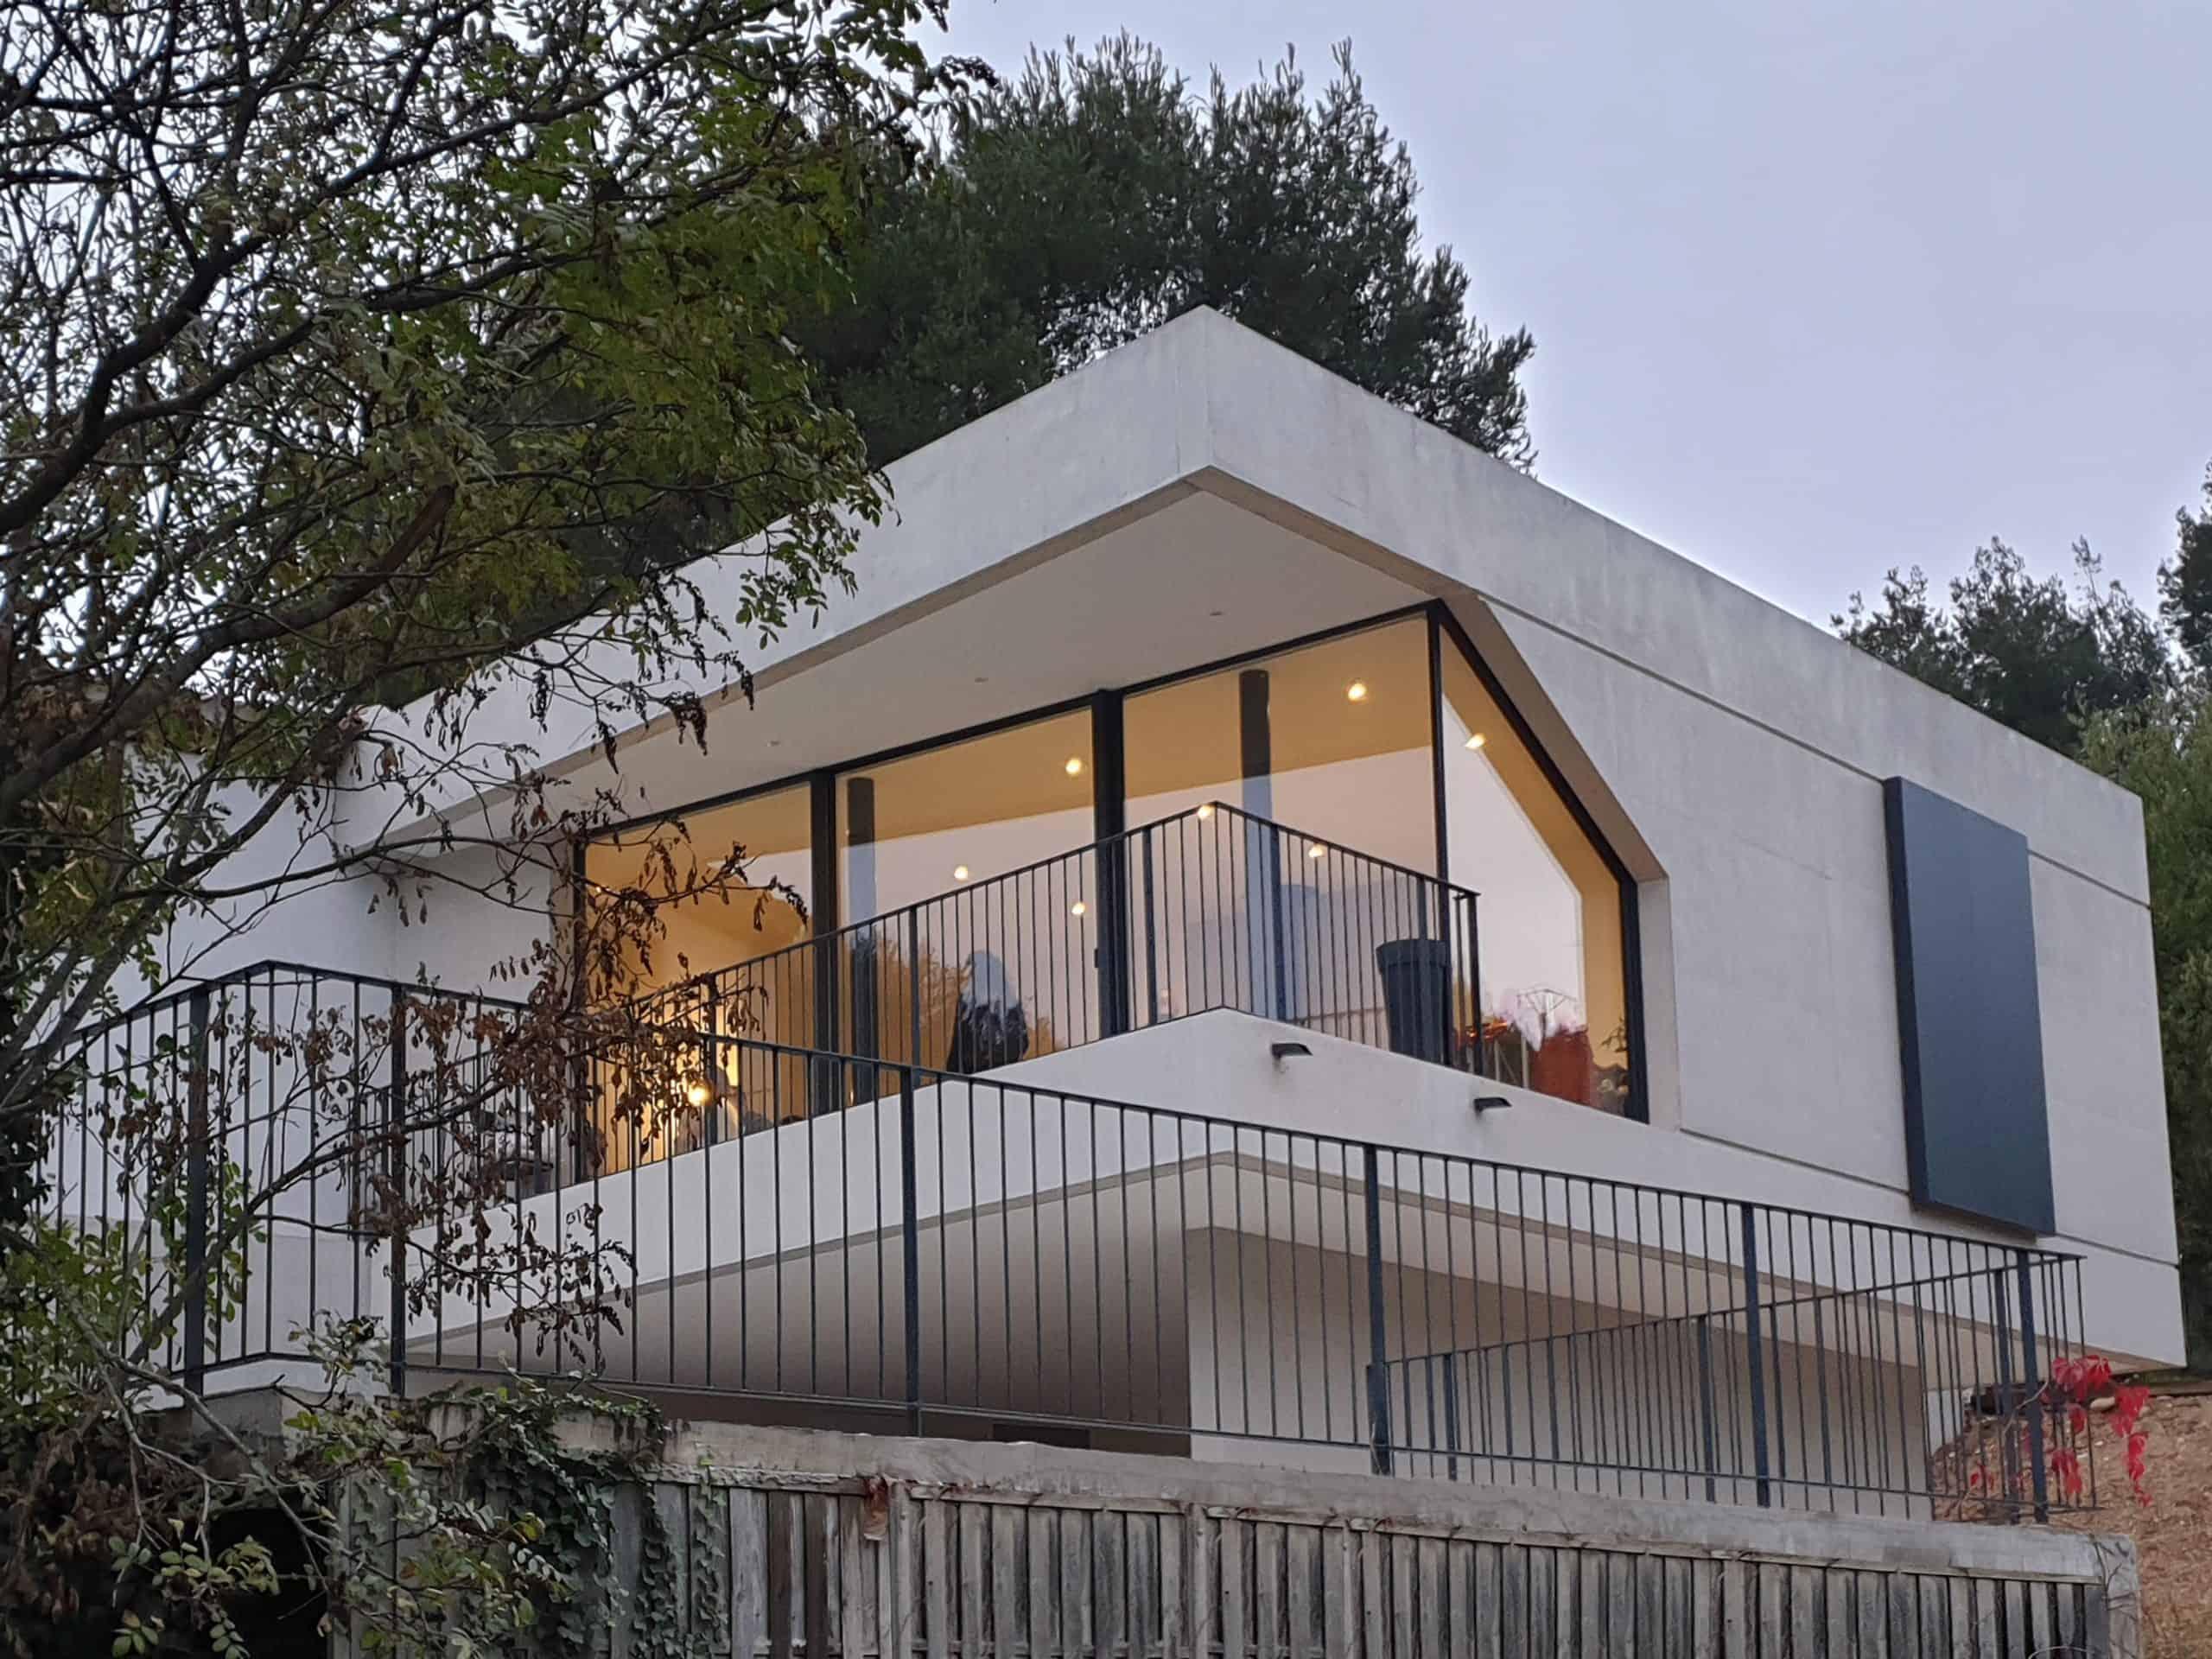 guillaume pepin architecte maison beton aubagne batiment realisation_12